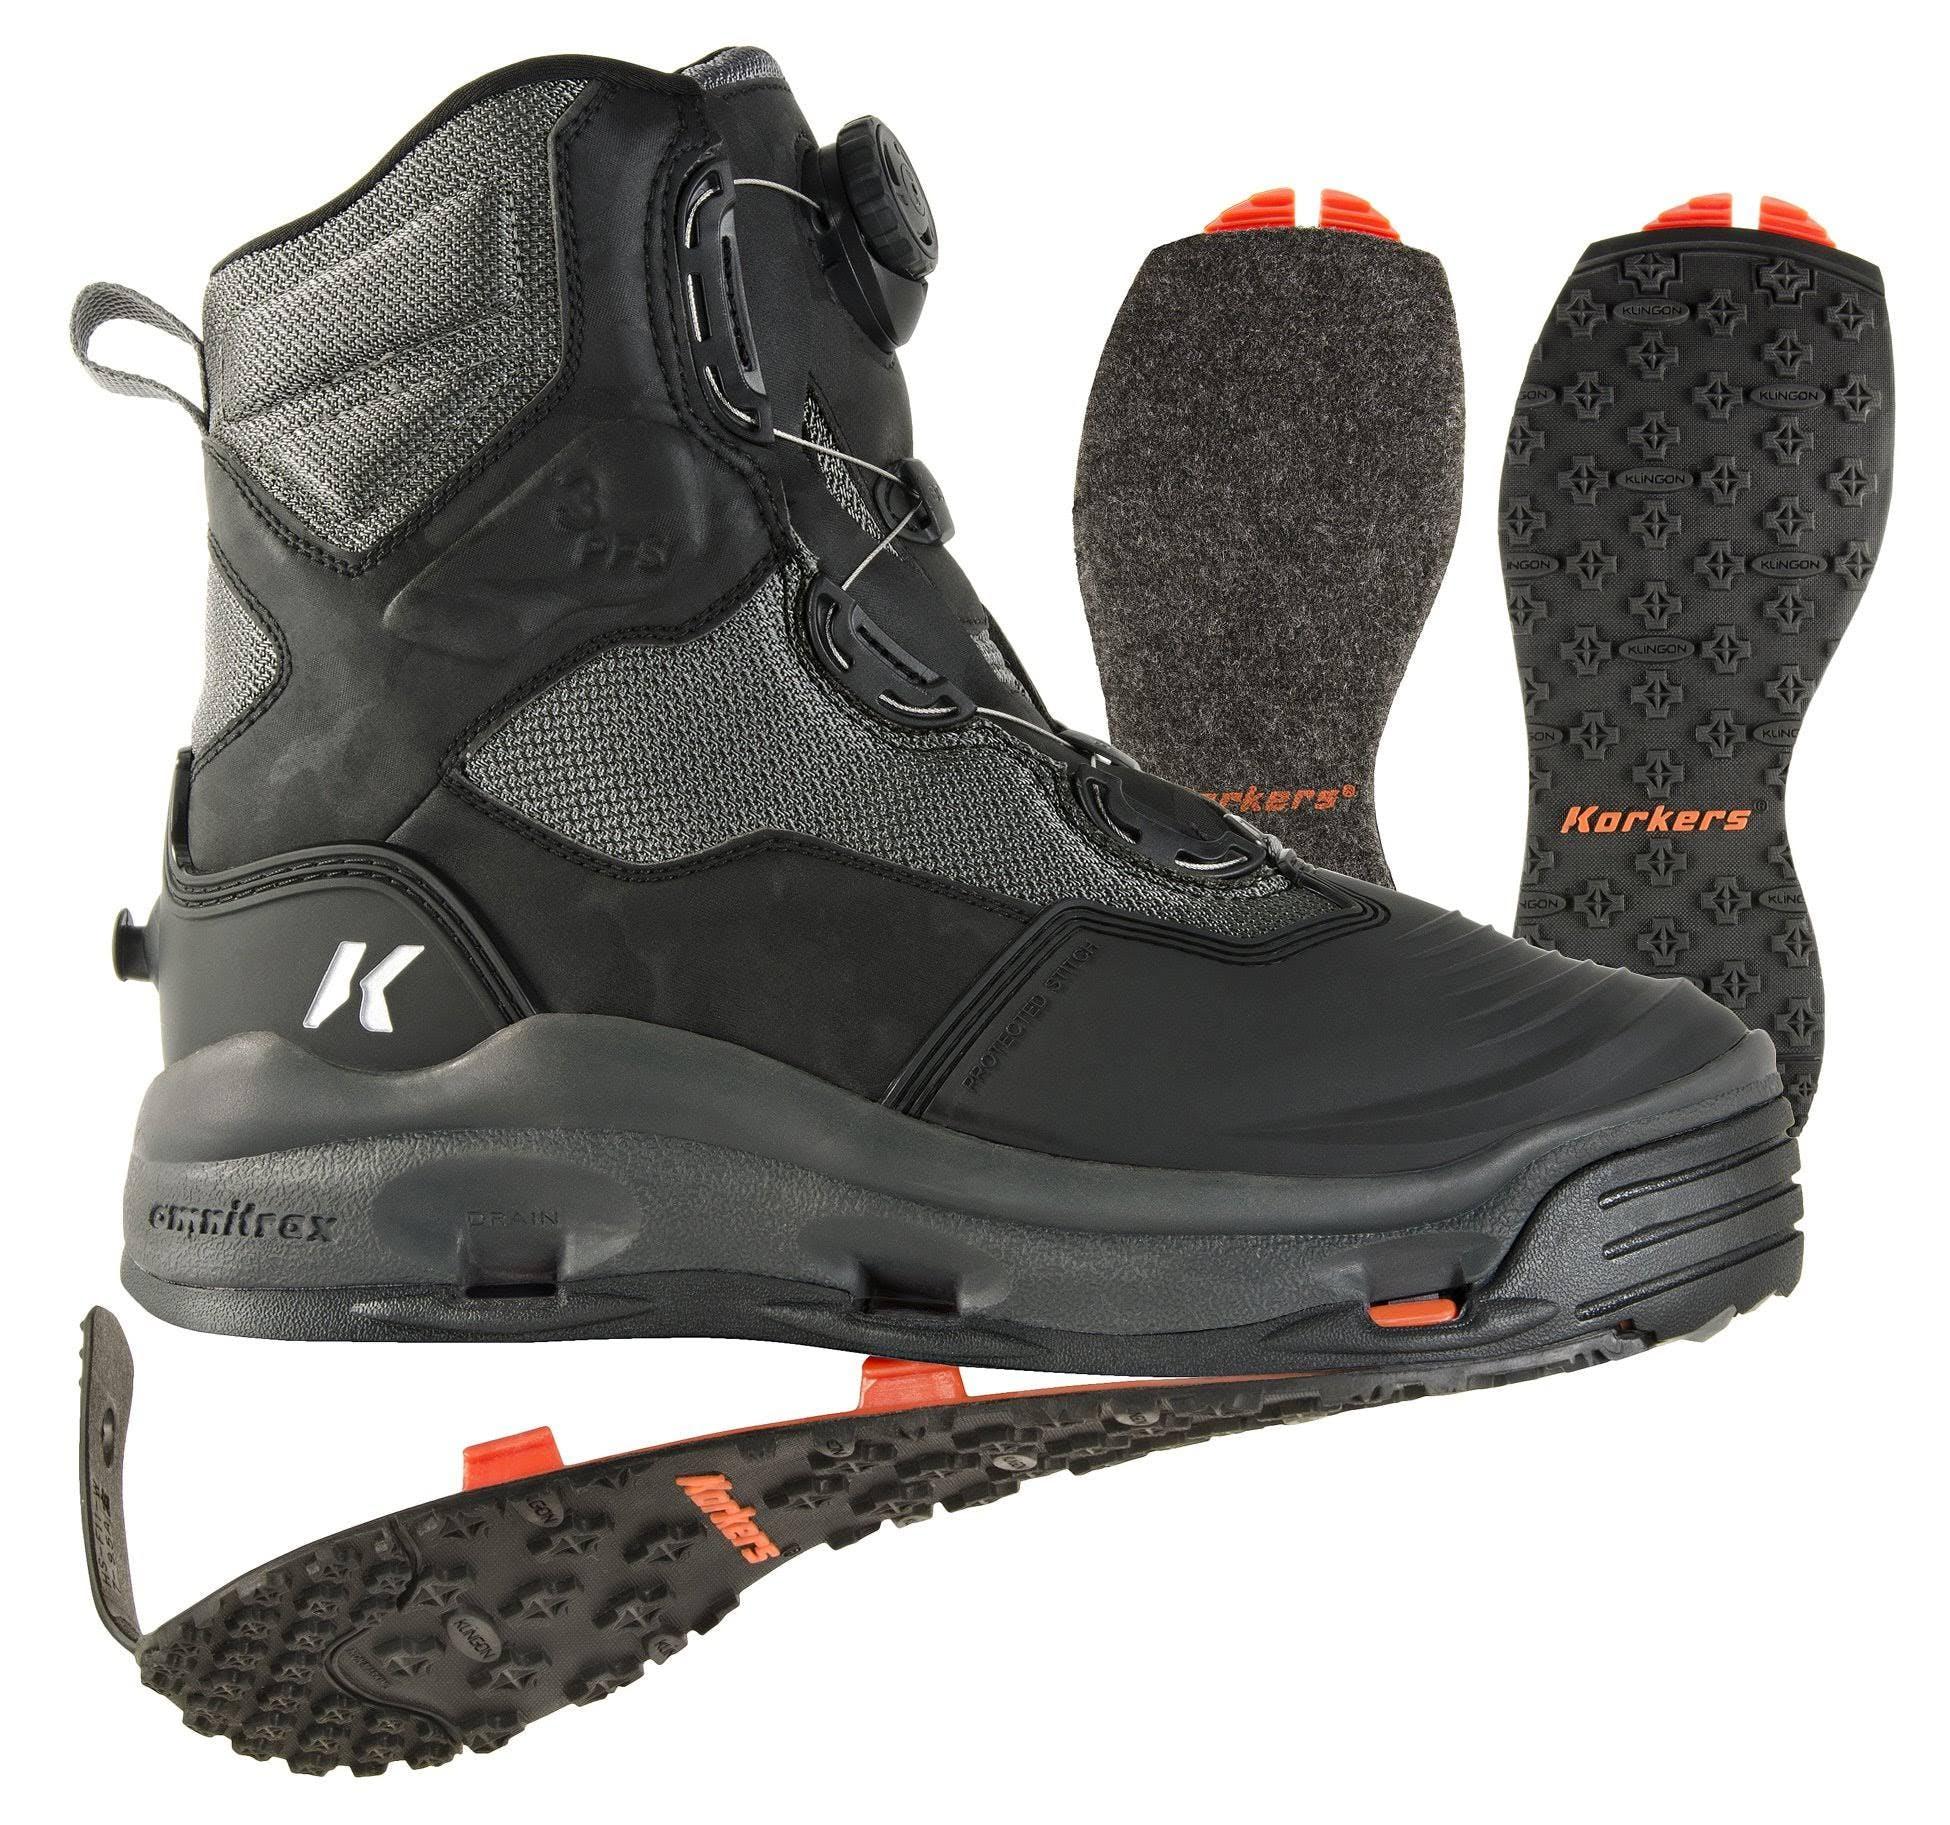 Korkers Darkhorse Wading Boot - Felt & Kling on 8